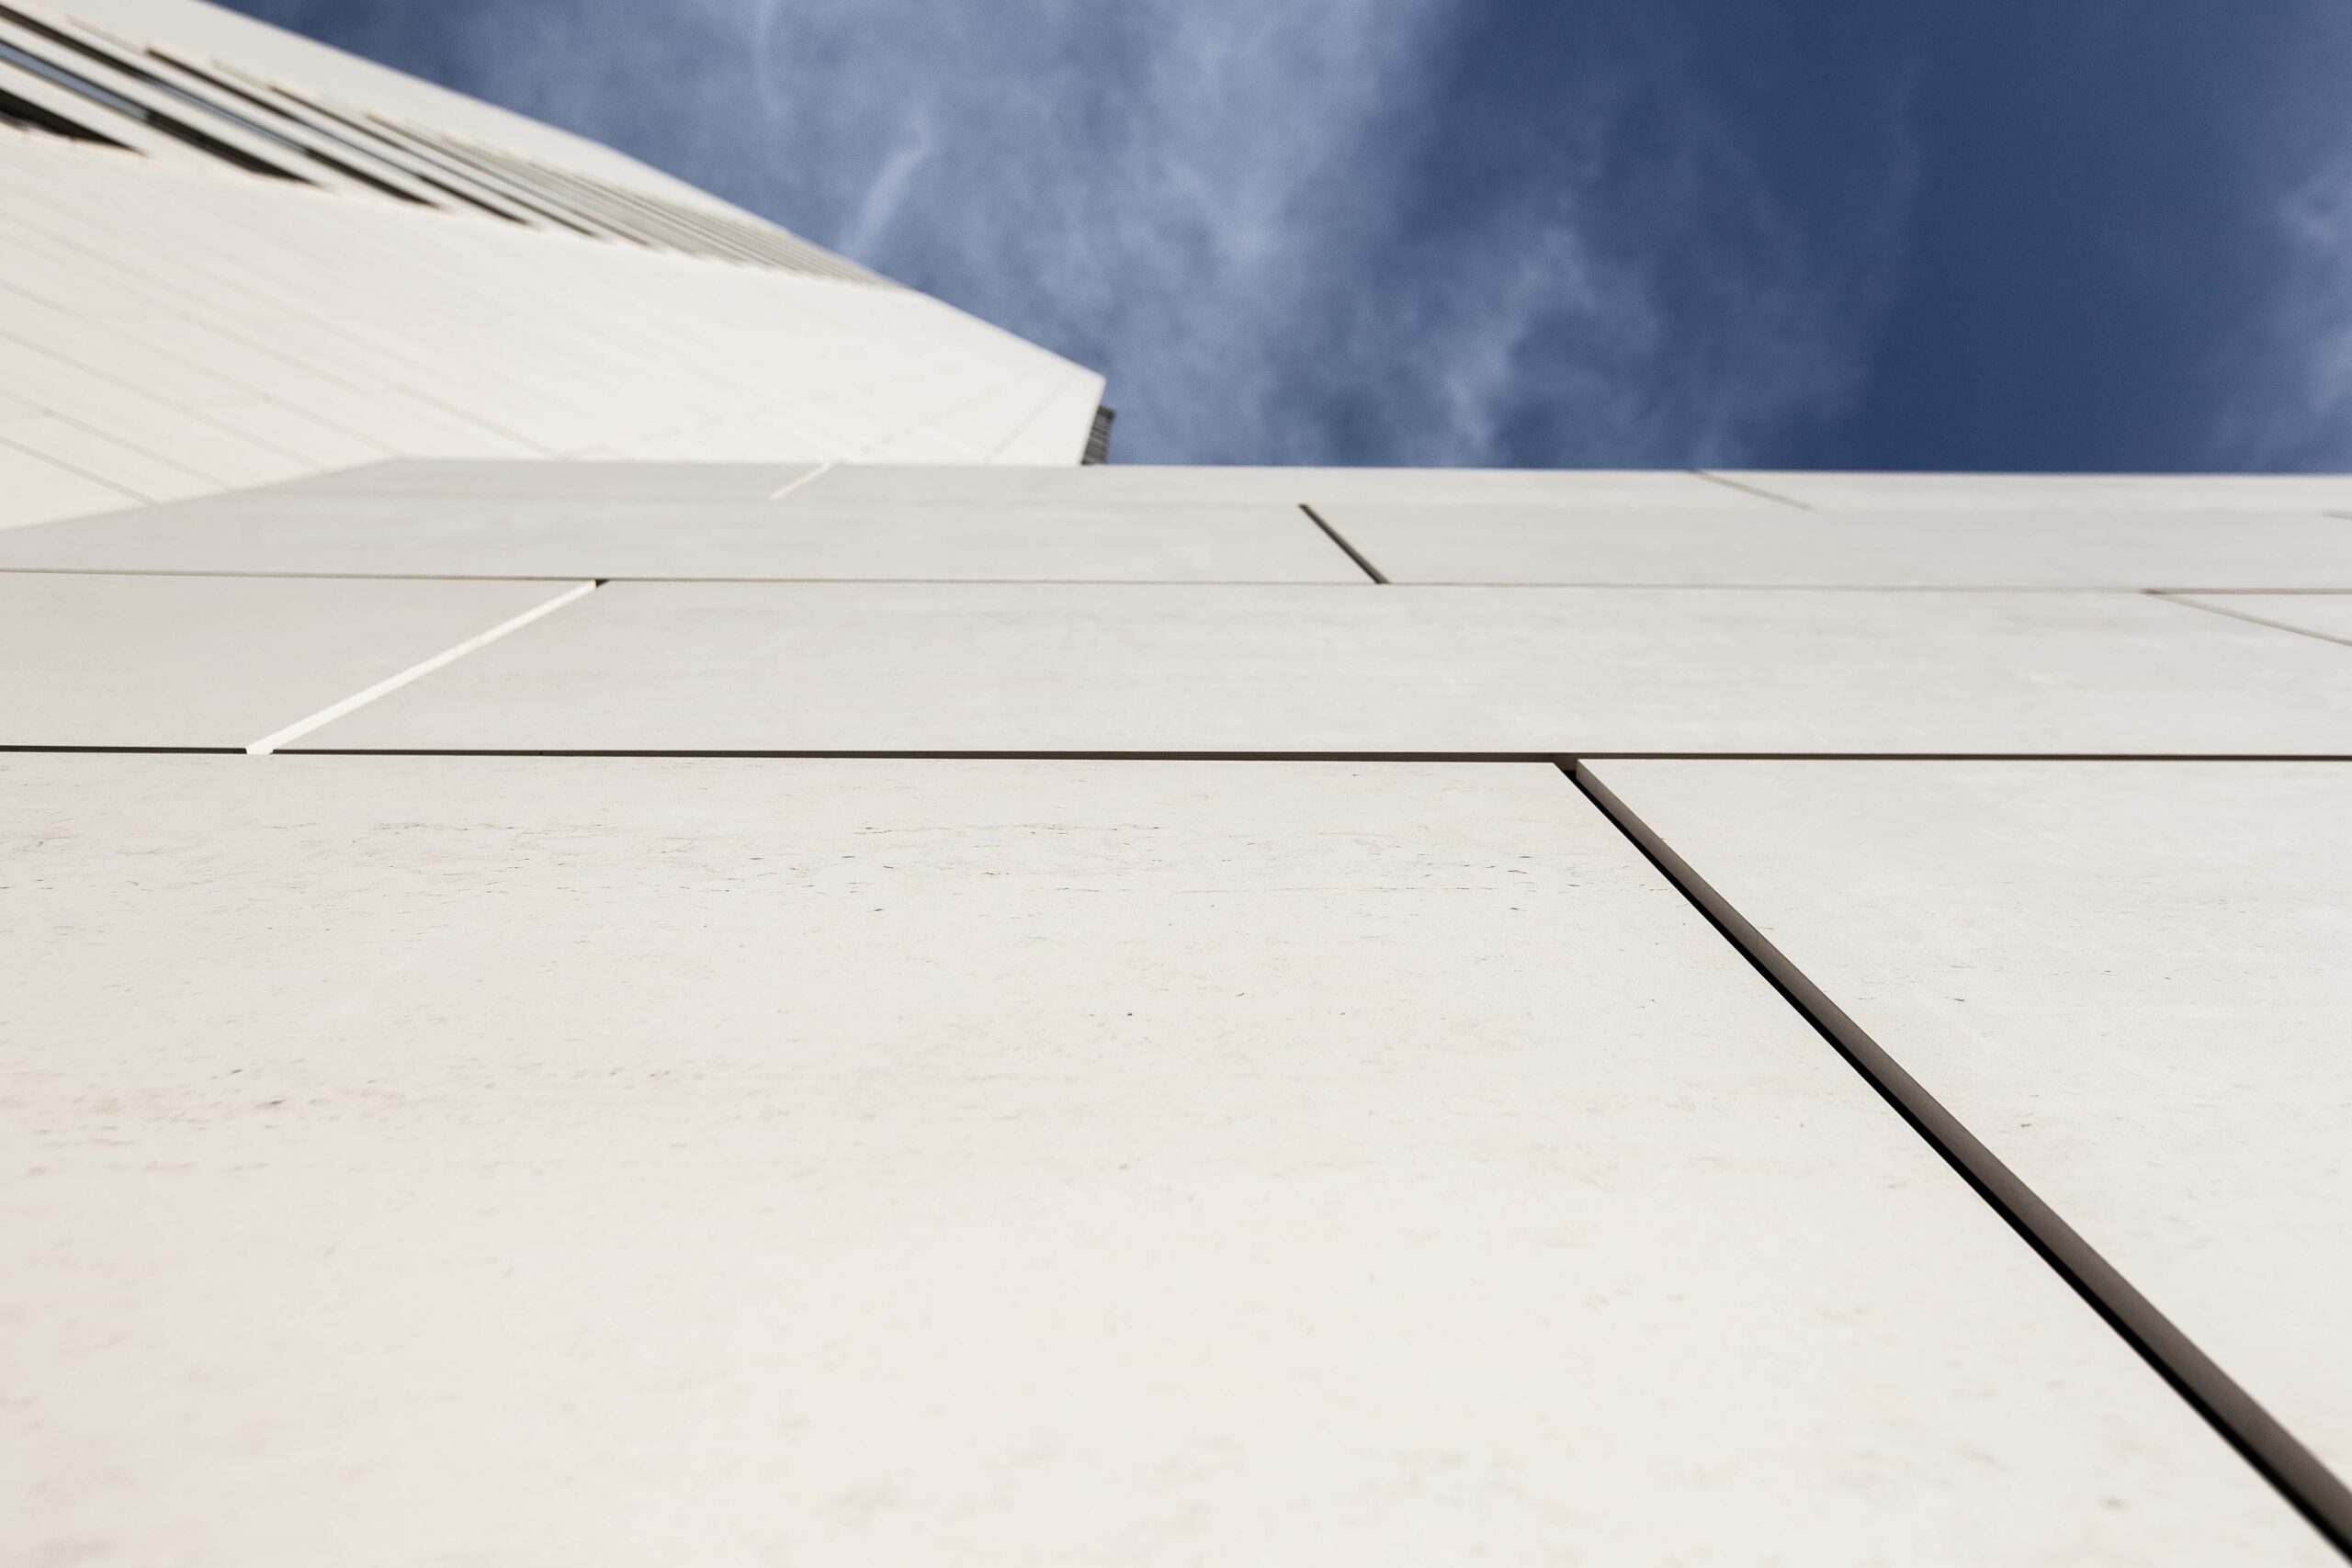 Torre Hooghe  - Cosentino tHoogheHuysAntwerpen PhotobyOrianaGomez Zerpa 300ppi 3 min scaled 46